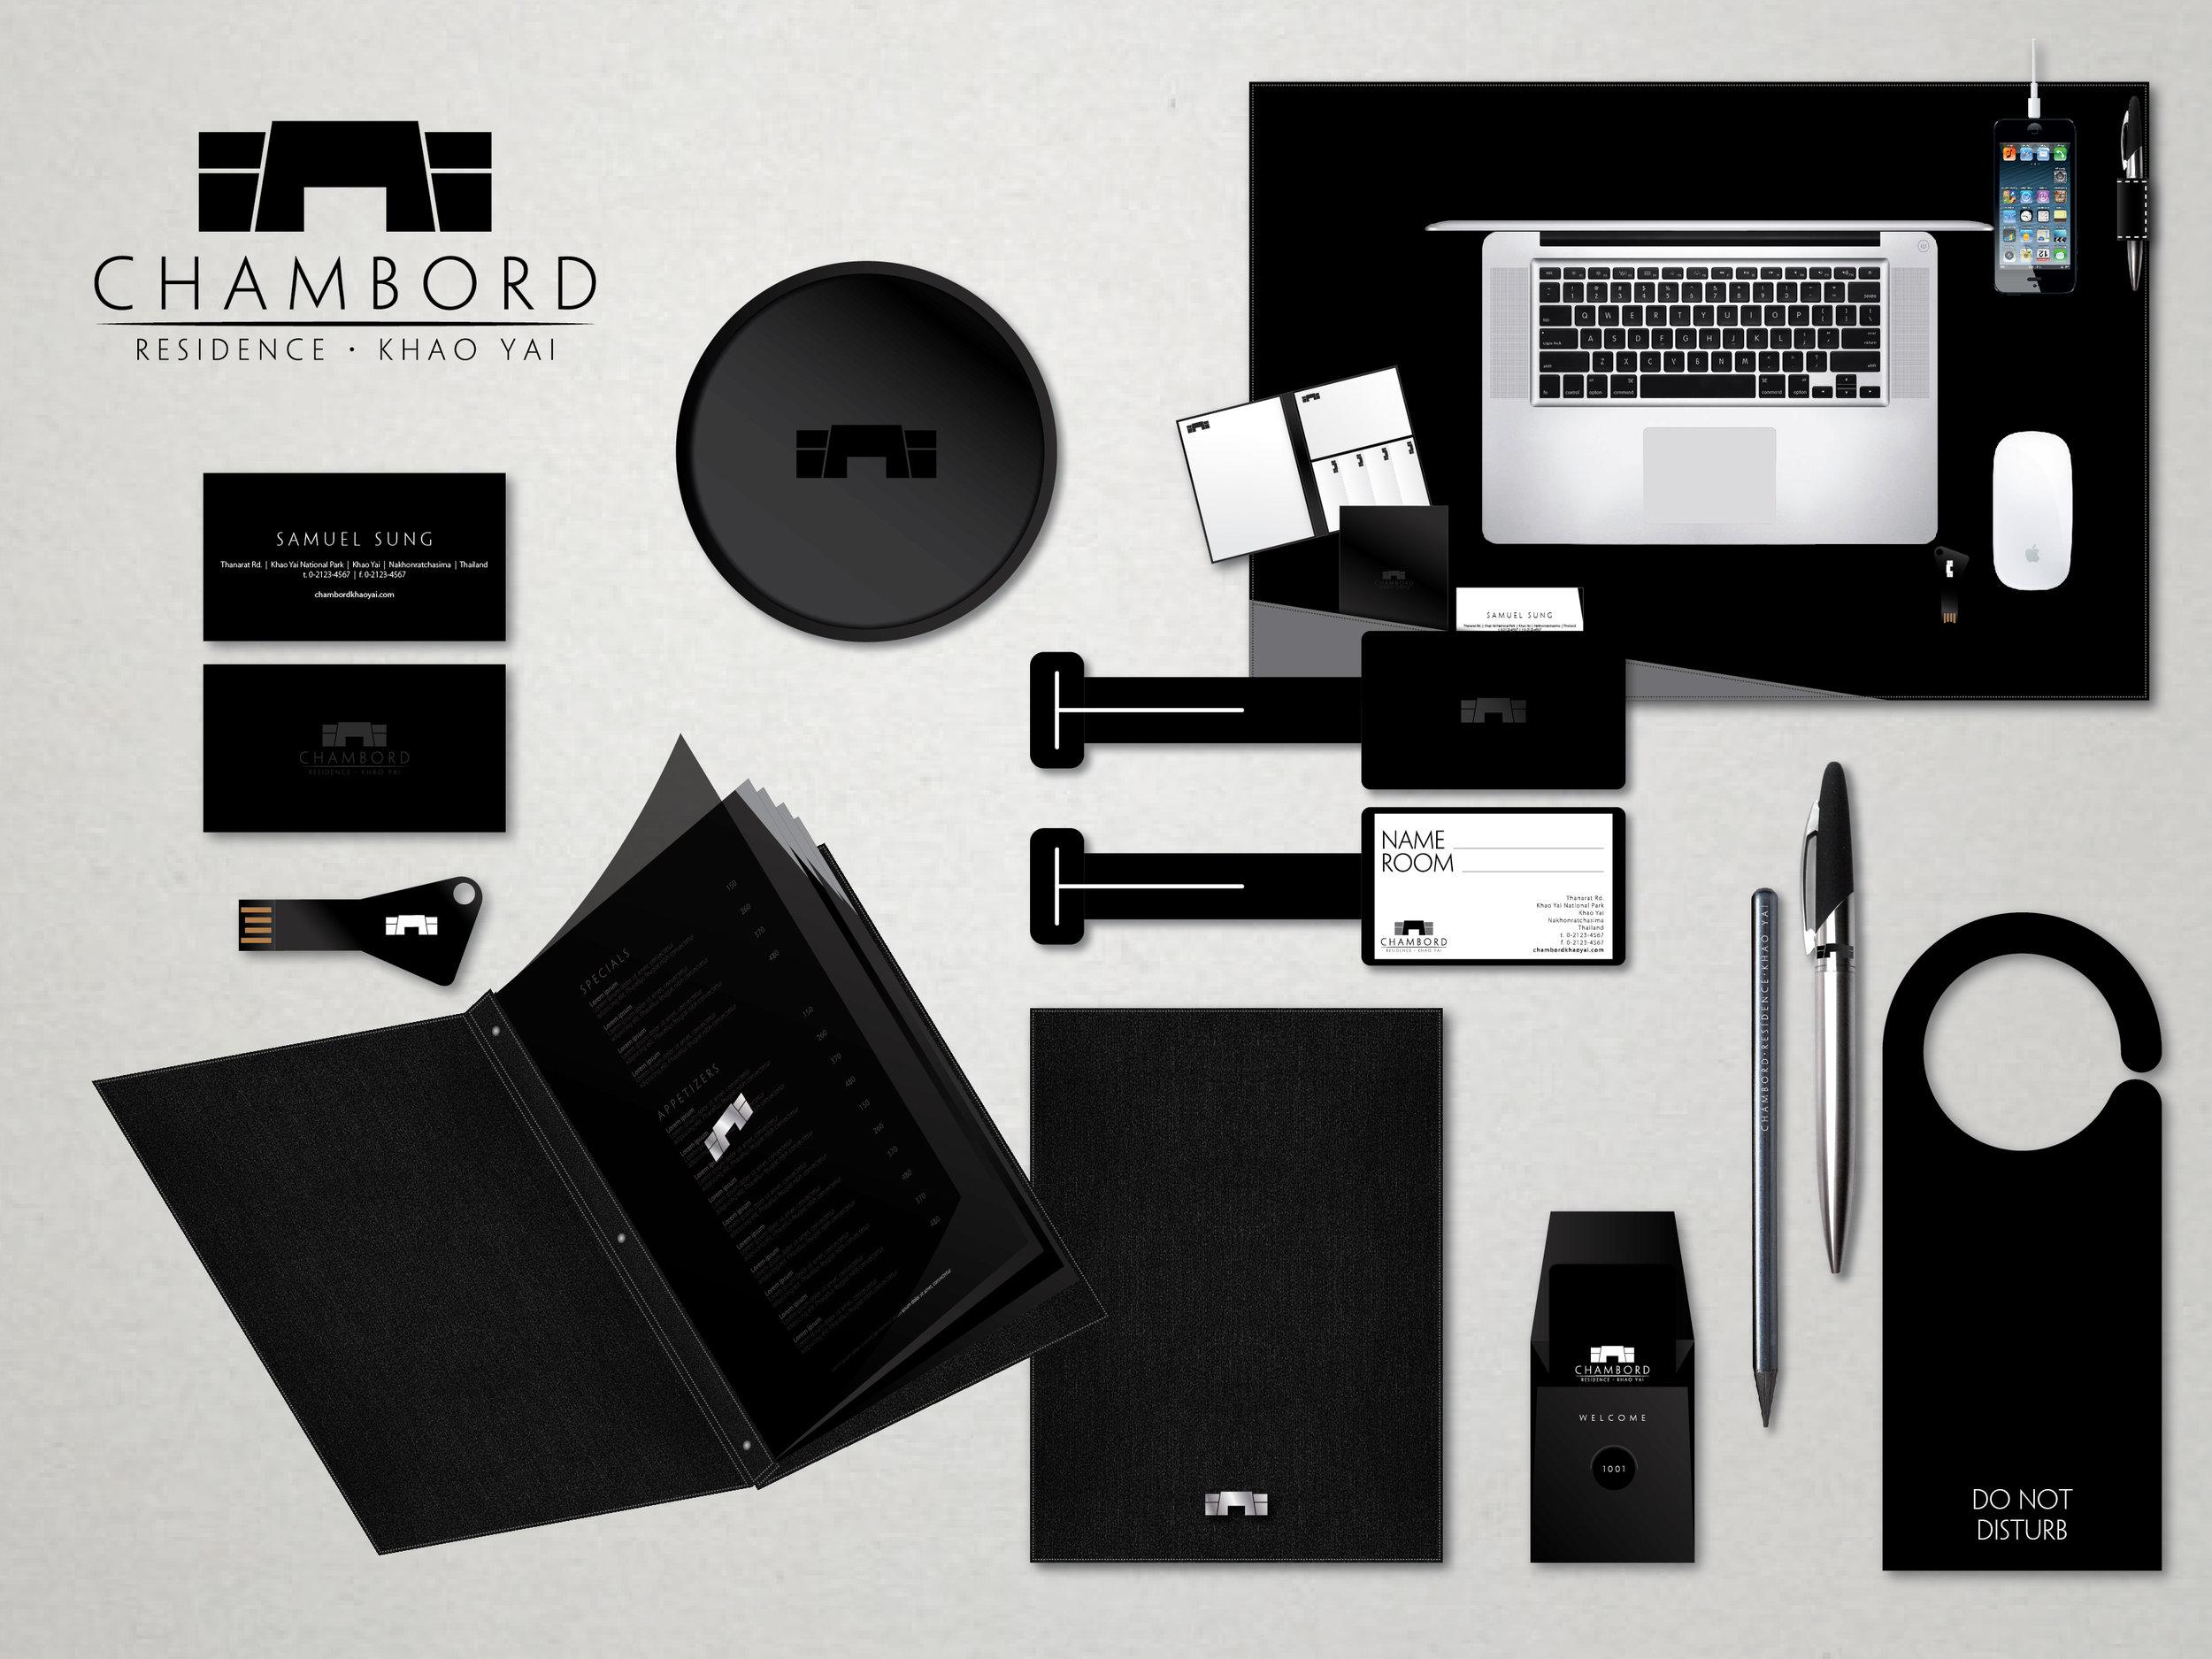 SA_Chambord_Moodboard-01.jpg